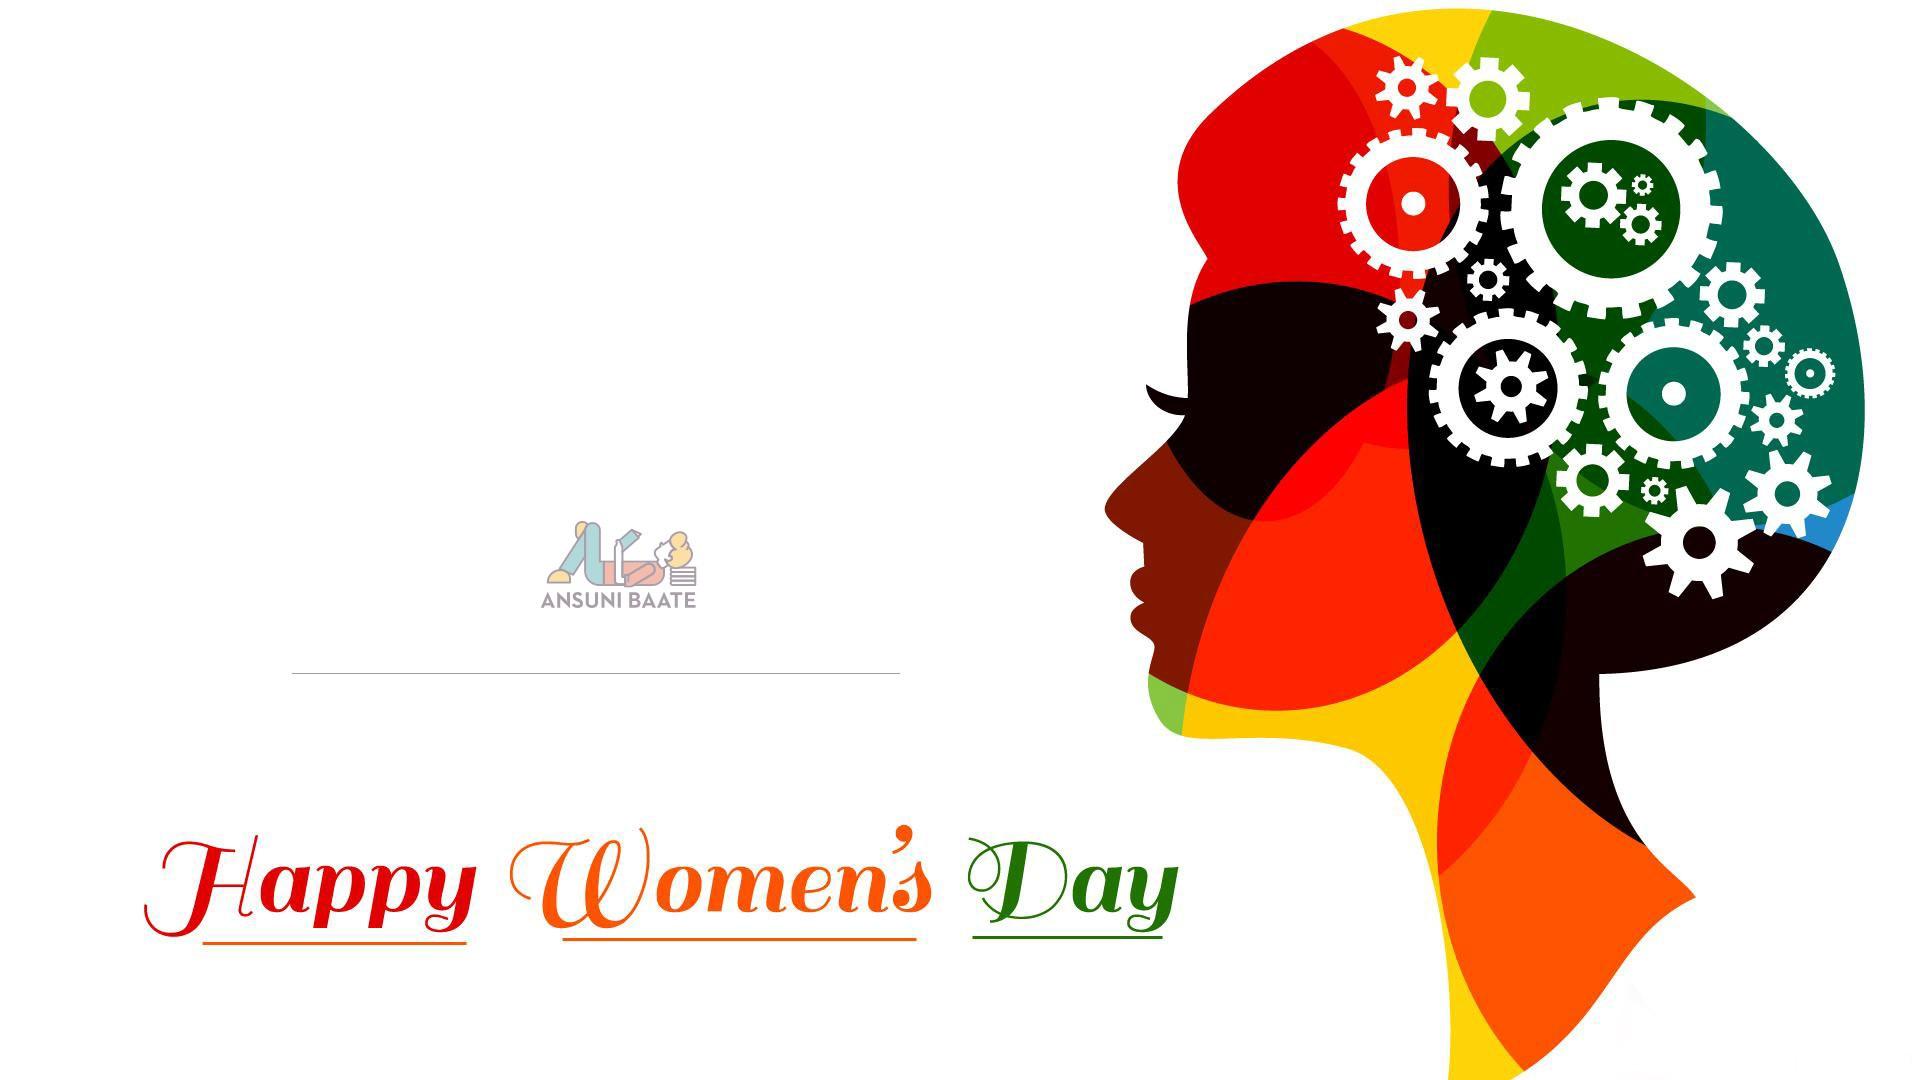 International Women's Day download image